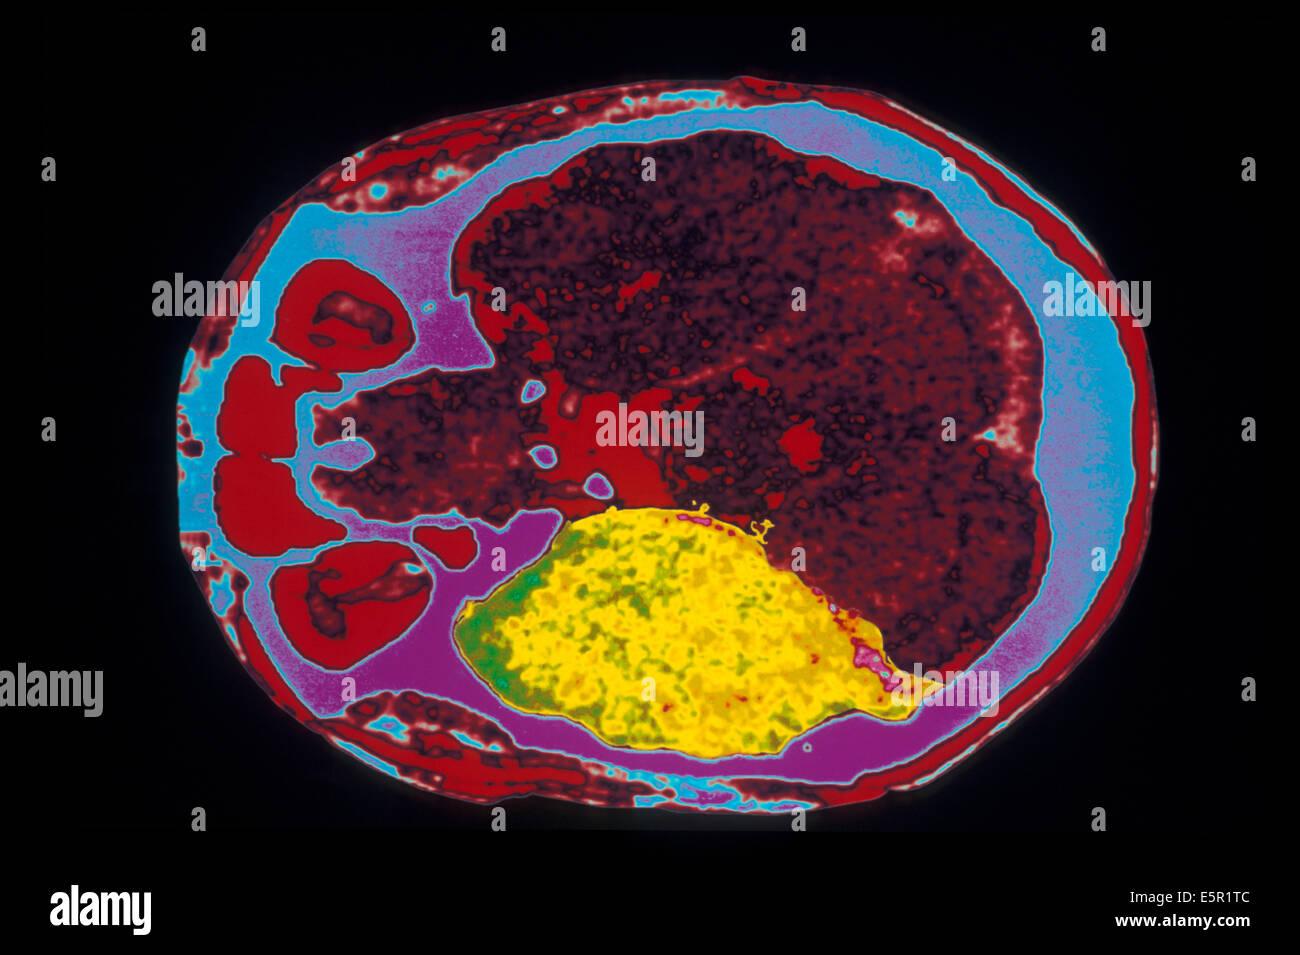 Encephalitis Brain Photos & Encephalitis Brain Images - Alamy